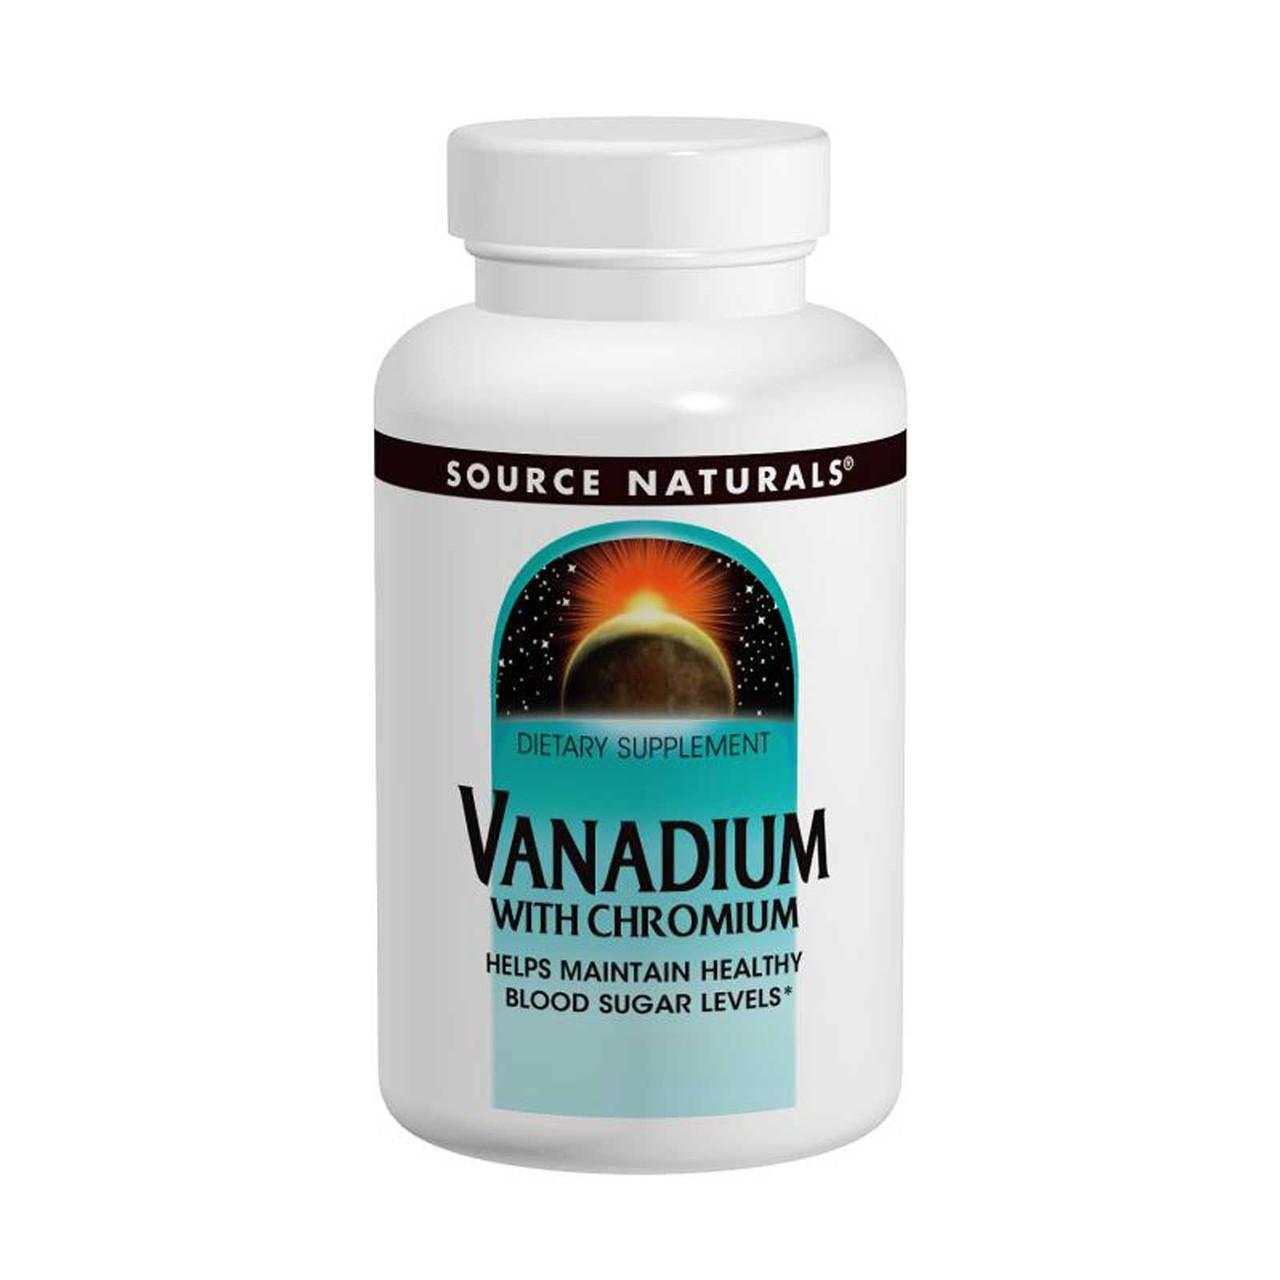 Ванадий с хромом, Source Naturals, 90 таблеток